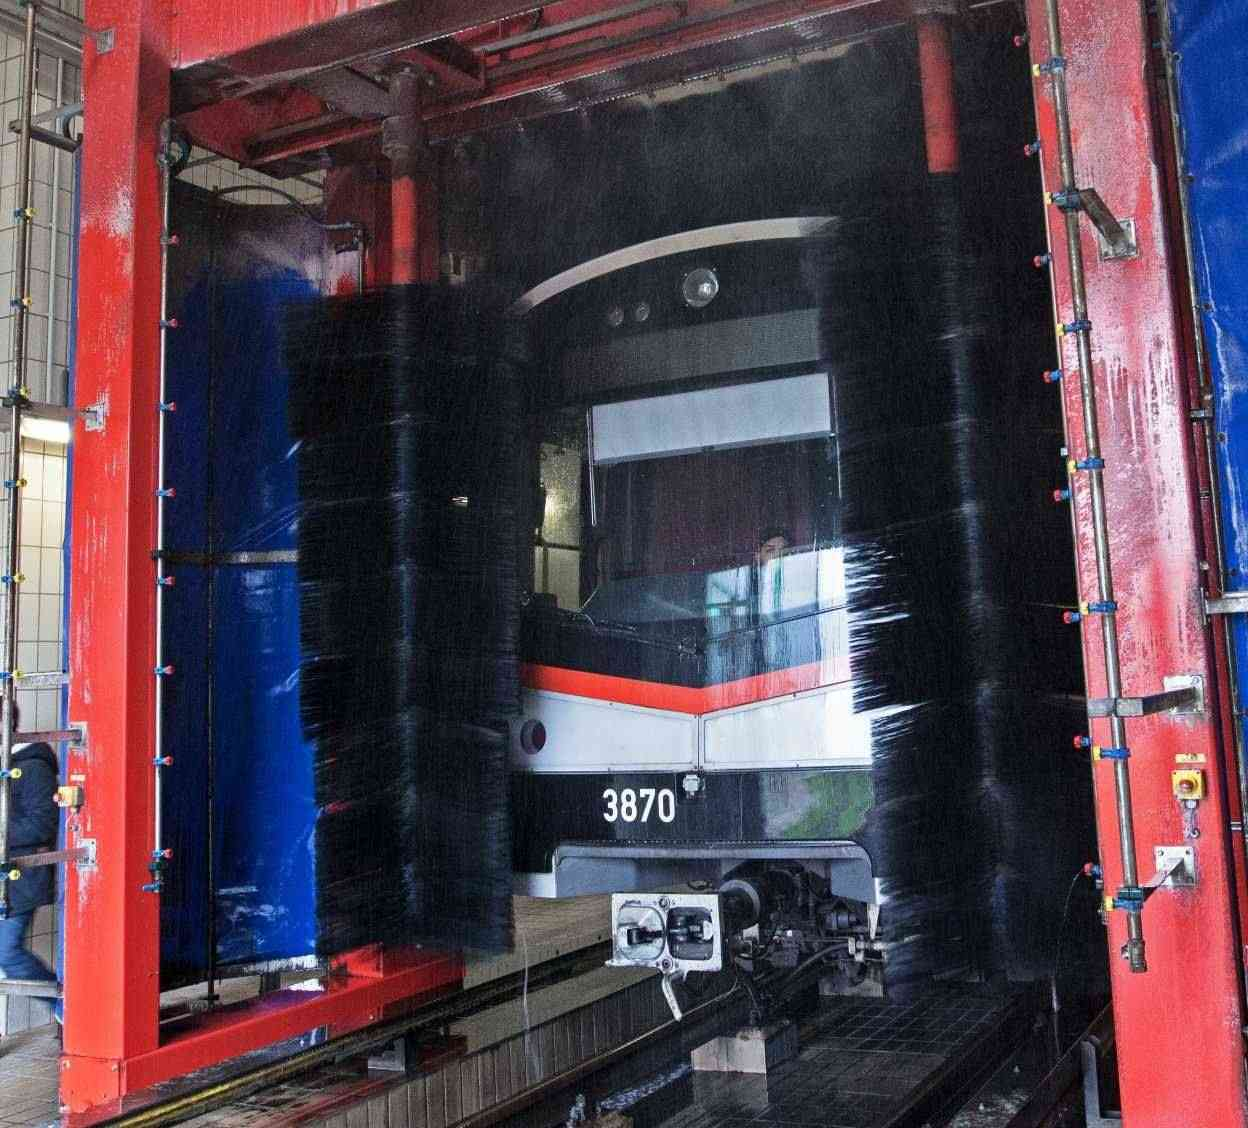 Große Bürsten säubern die U-Bahn-Züge.